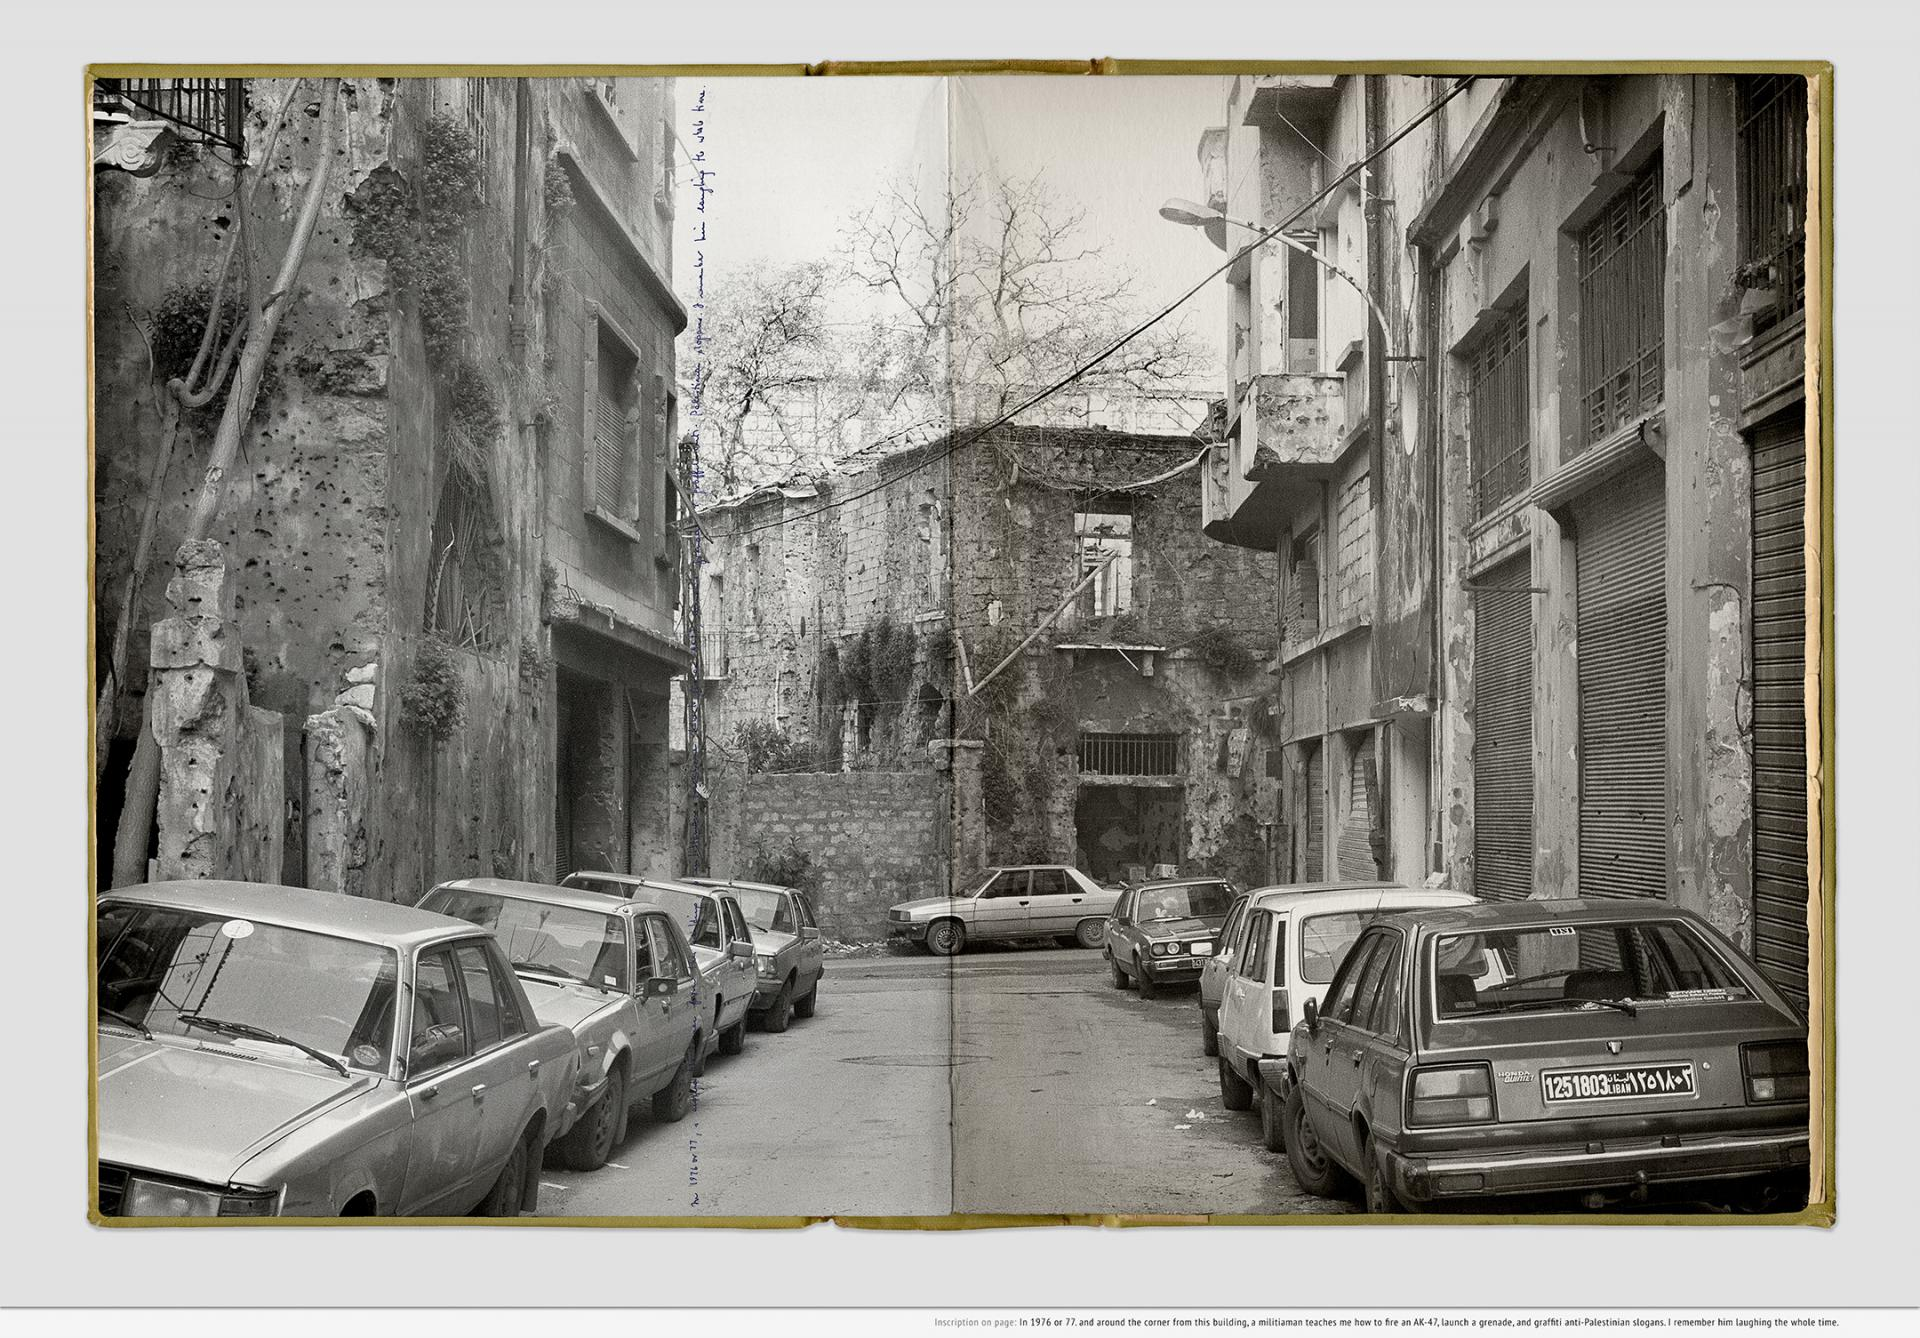 Sweet Talk. Commissions (Beirut) _ 1987.003, 1987-2019, inkjet print, 54.3 x 76.3 x 3.5cm, framed